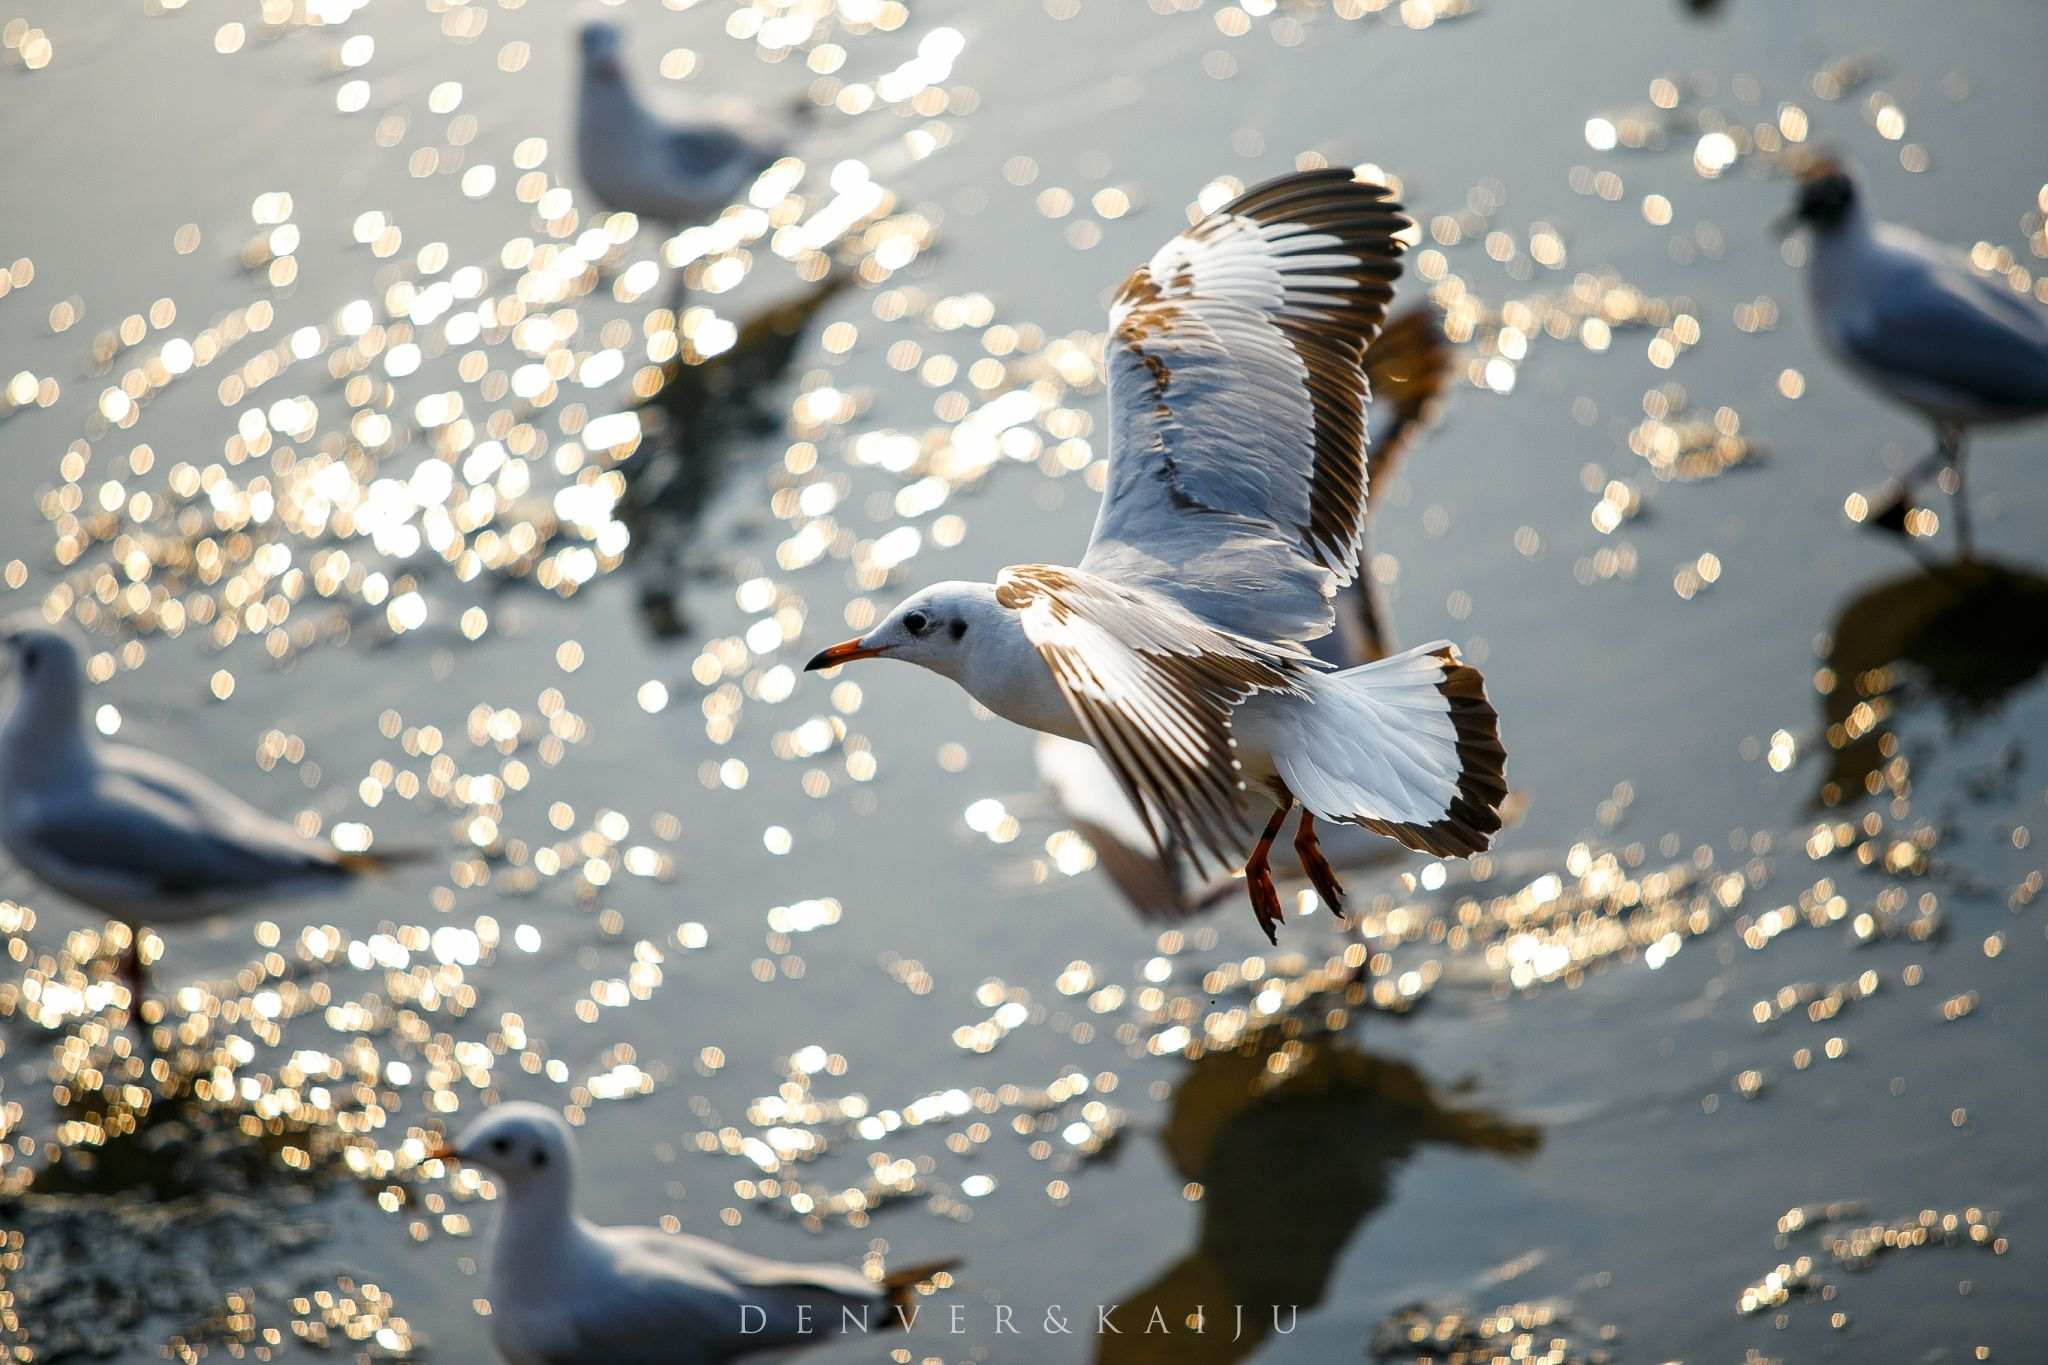 Bangpu seagull by Denver Kaiju on 500px